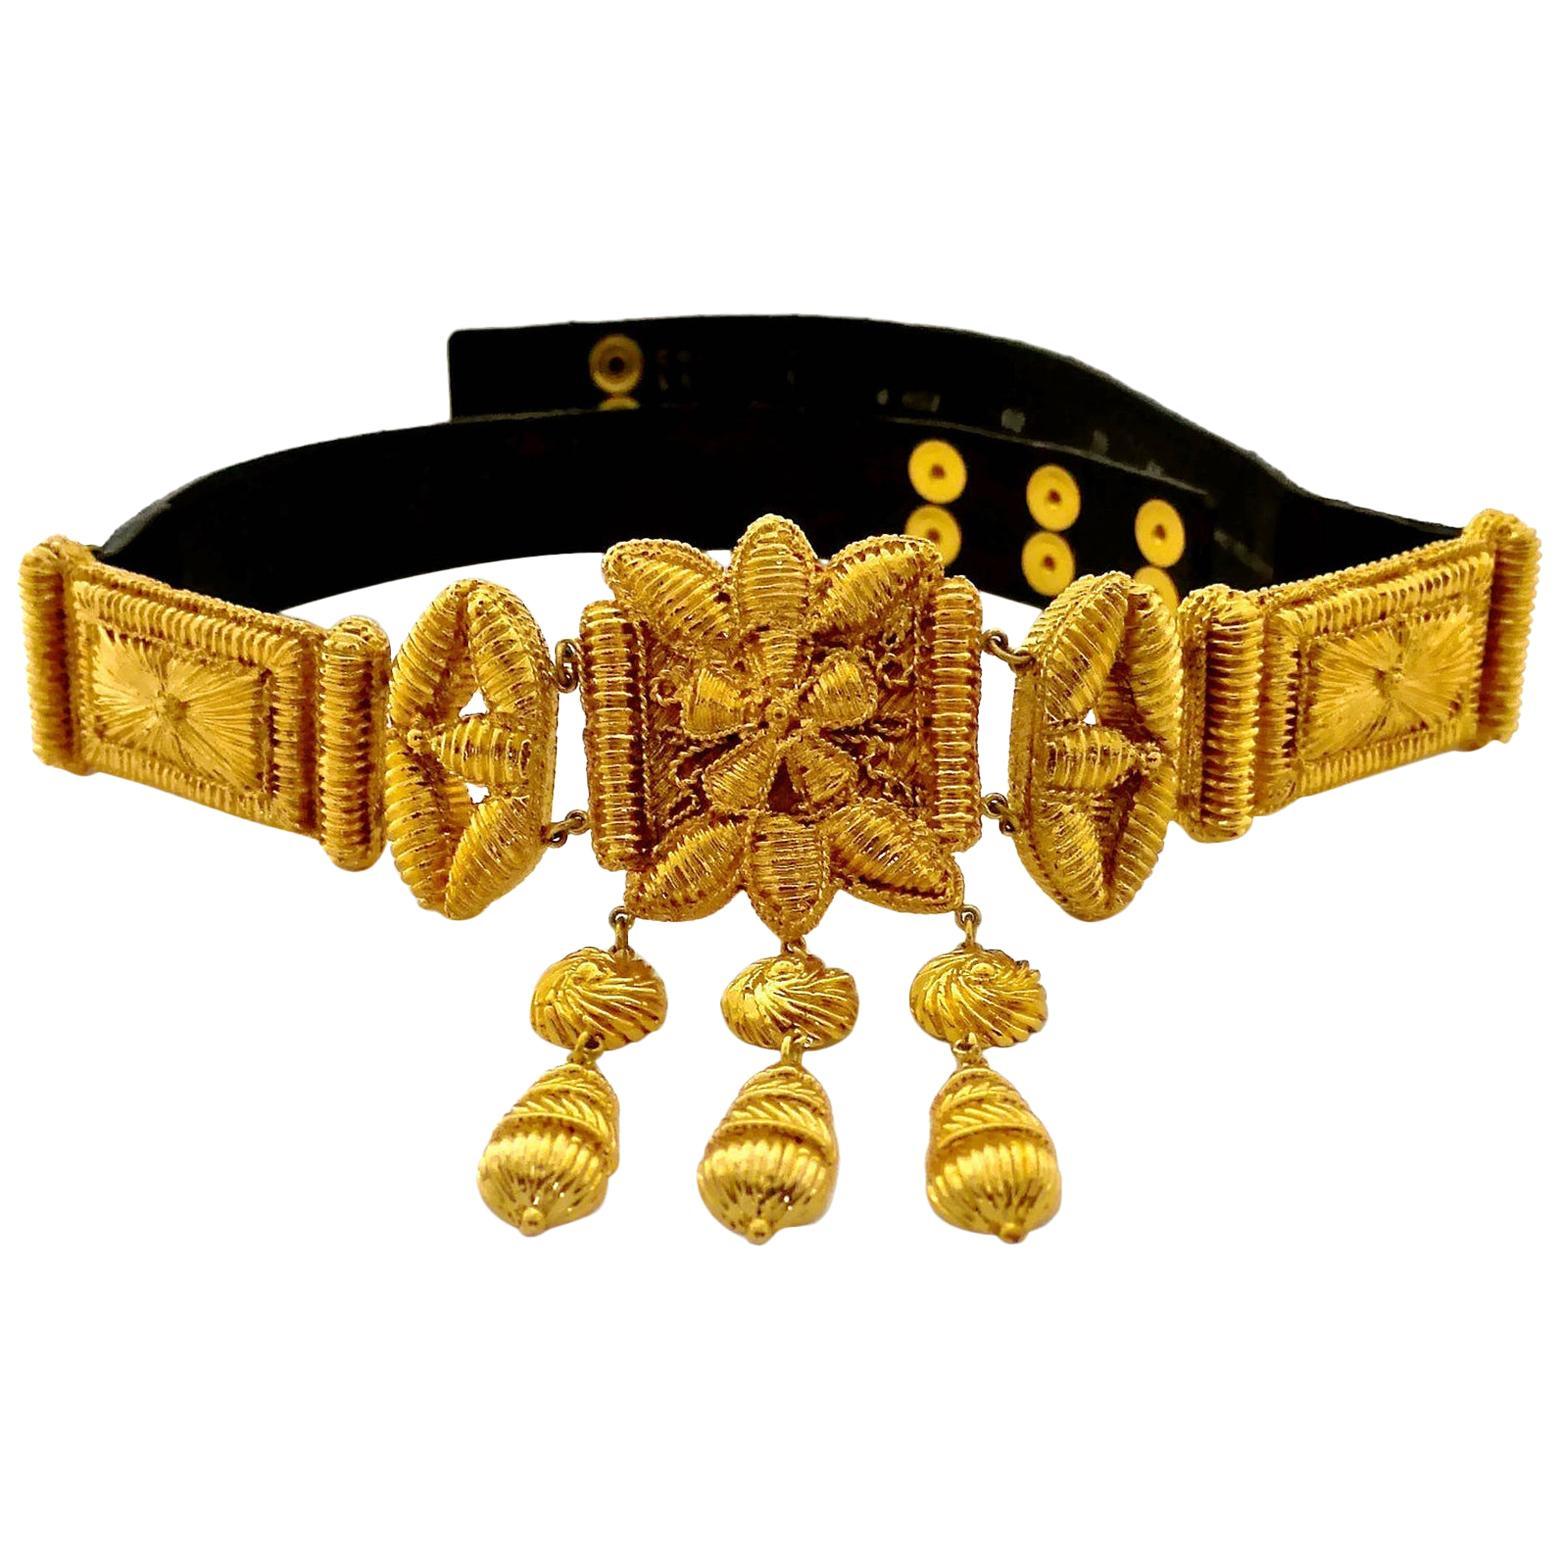 Vintage CHRISTIAN LACROIX Byzantine Mogul Belt